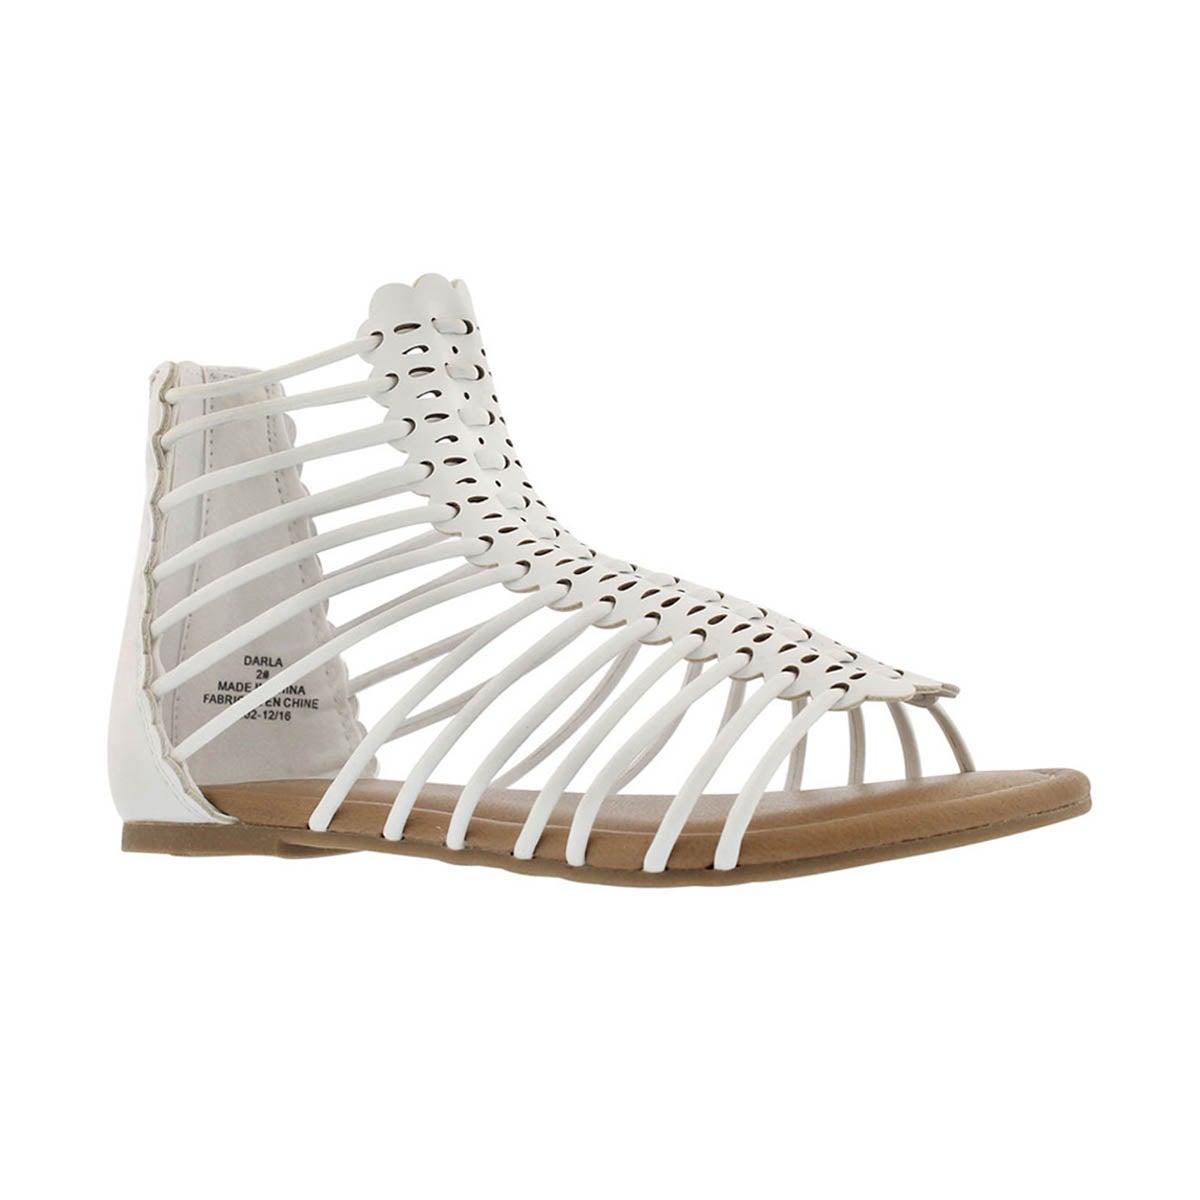 Girls' DARLA white casual sandals